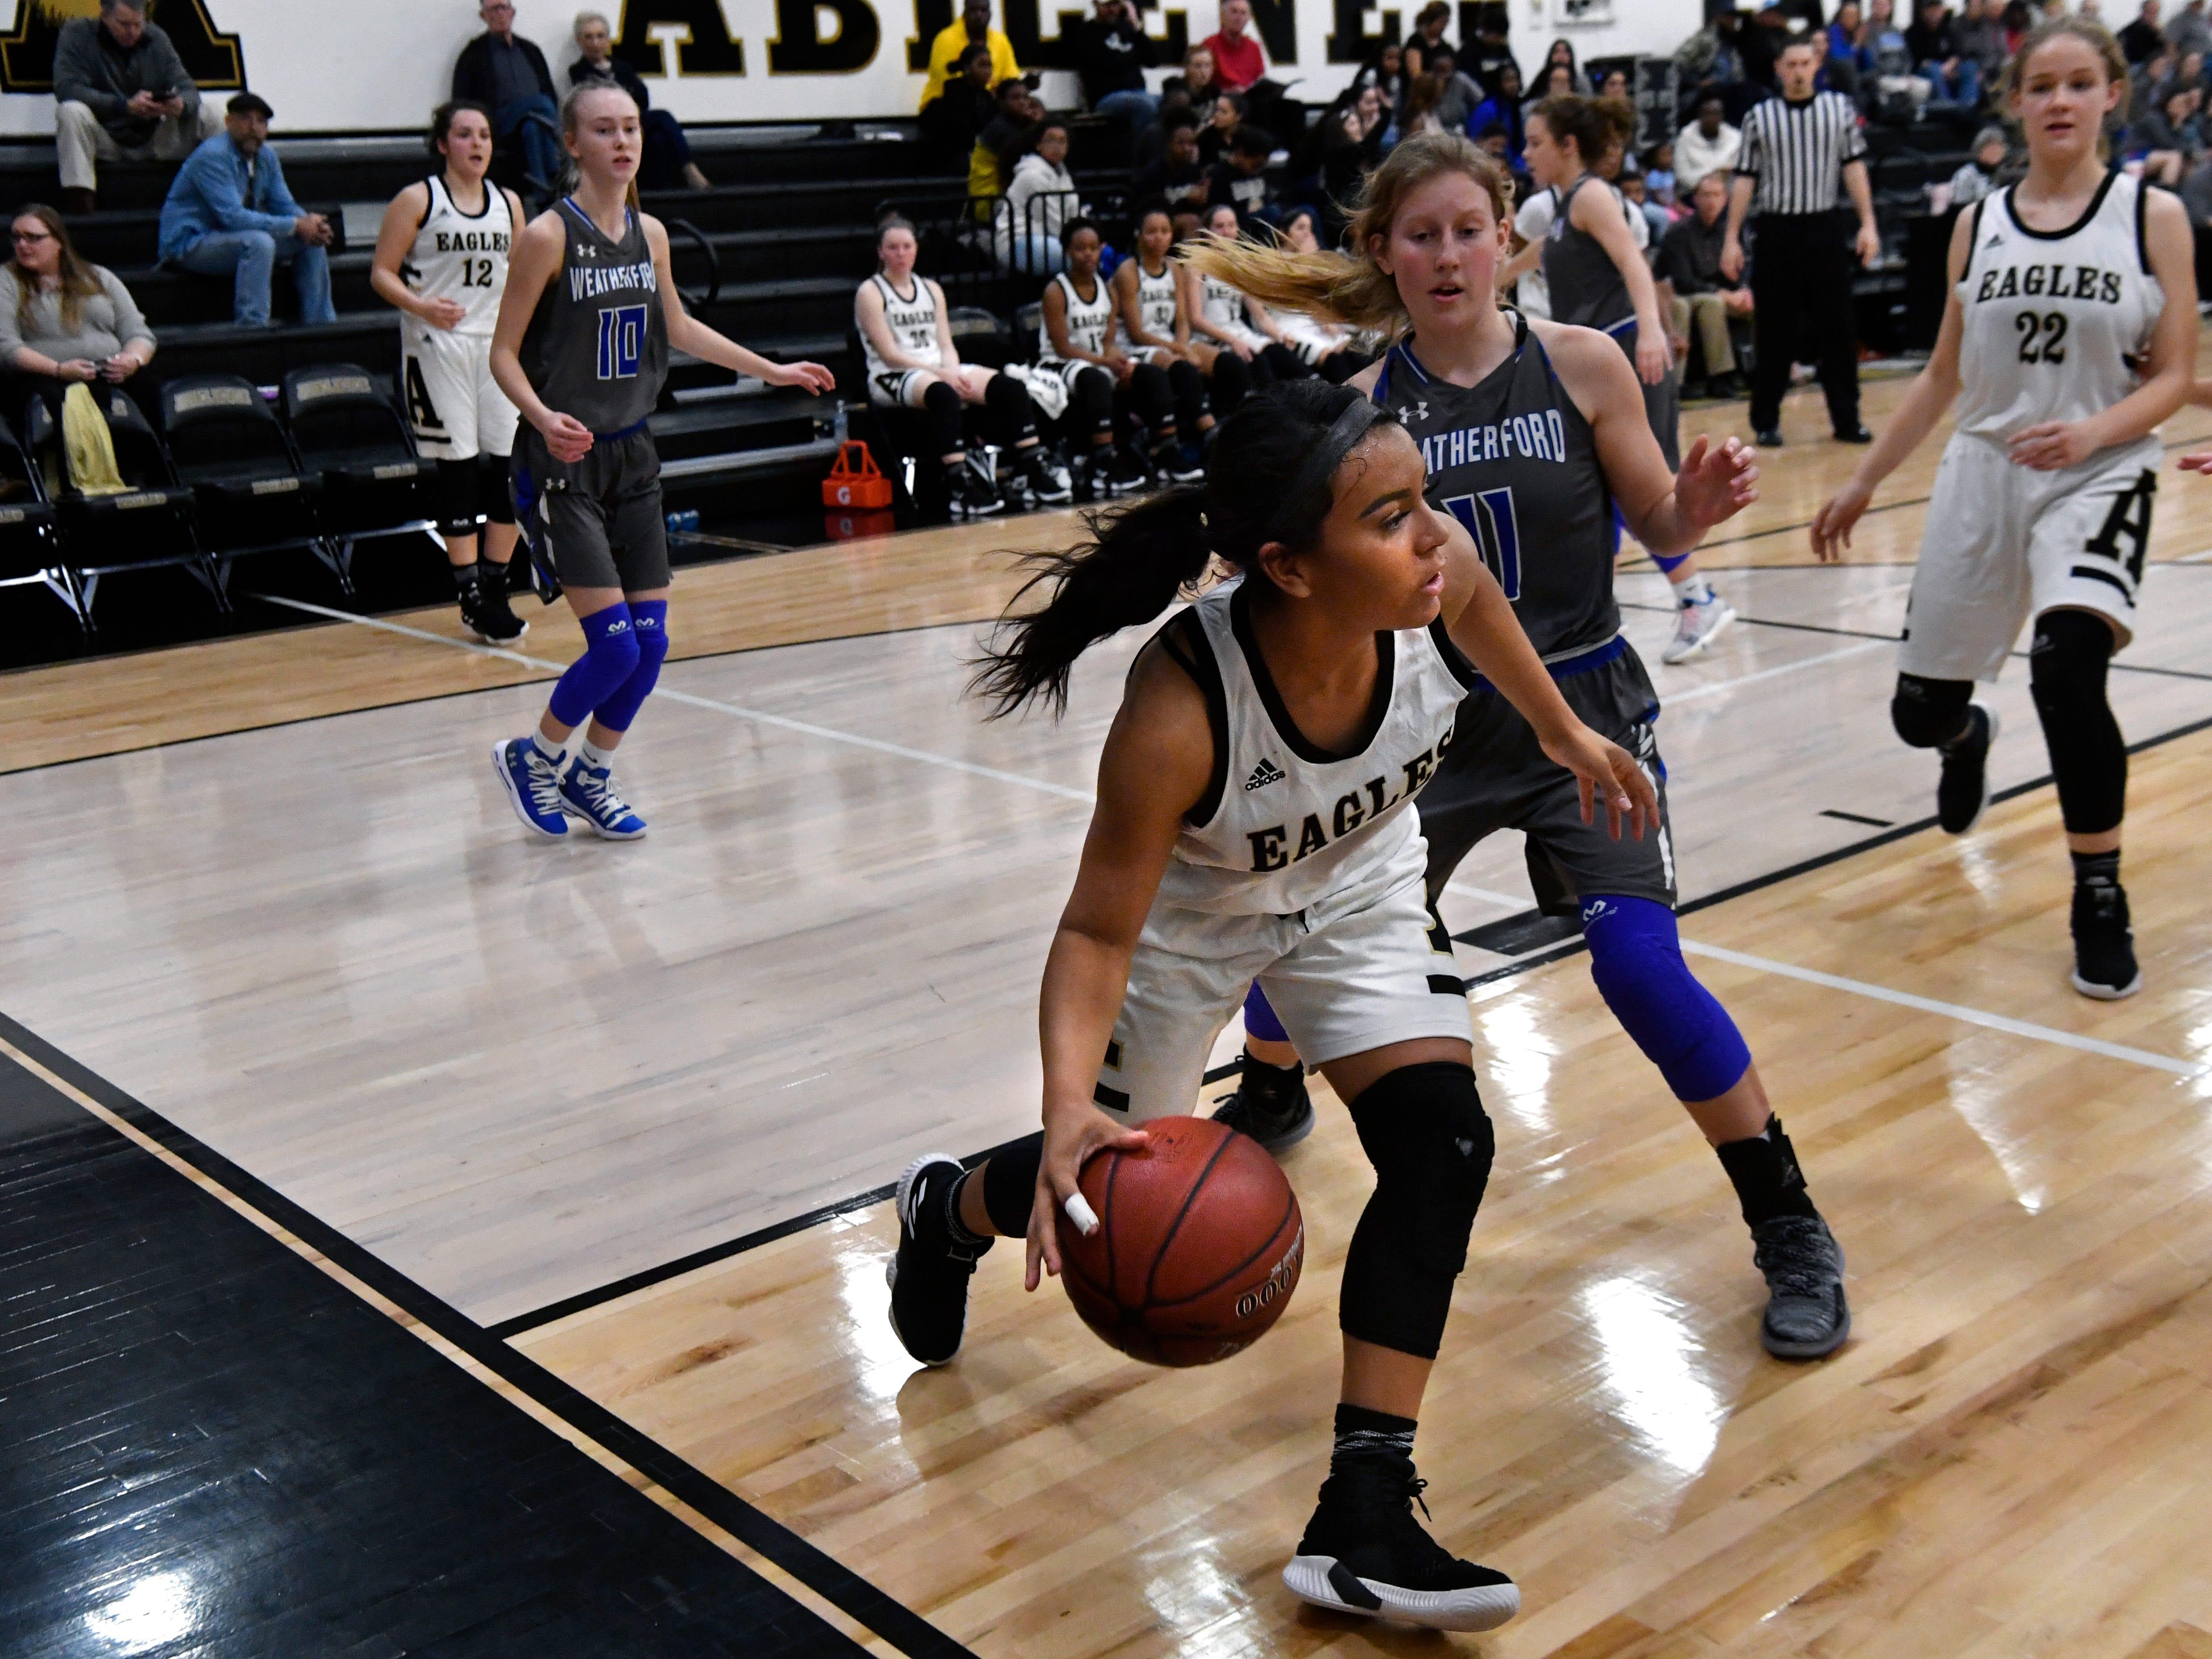 Alyssa Washington plays under the basket during Friday's game against Weatherford Jan. 11, 2019. Final score was 51-38, Abilene.